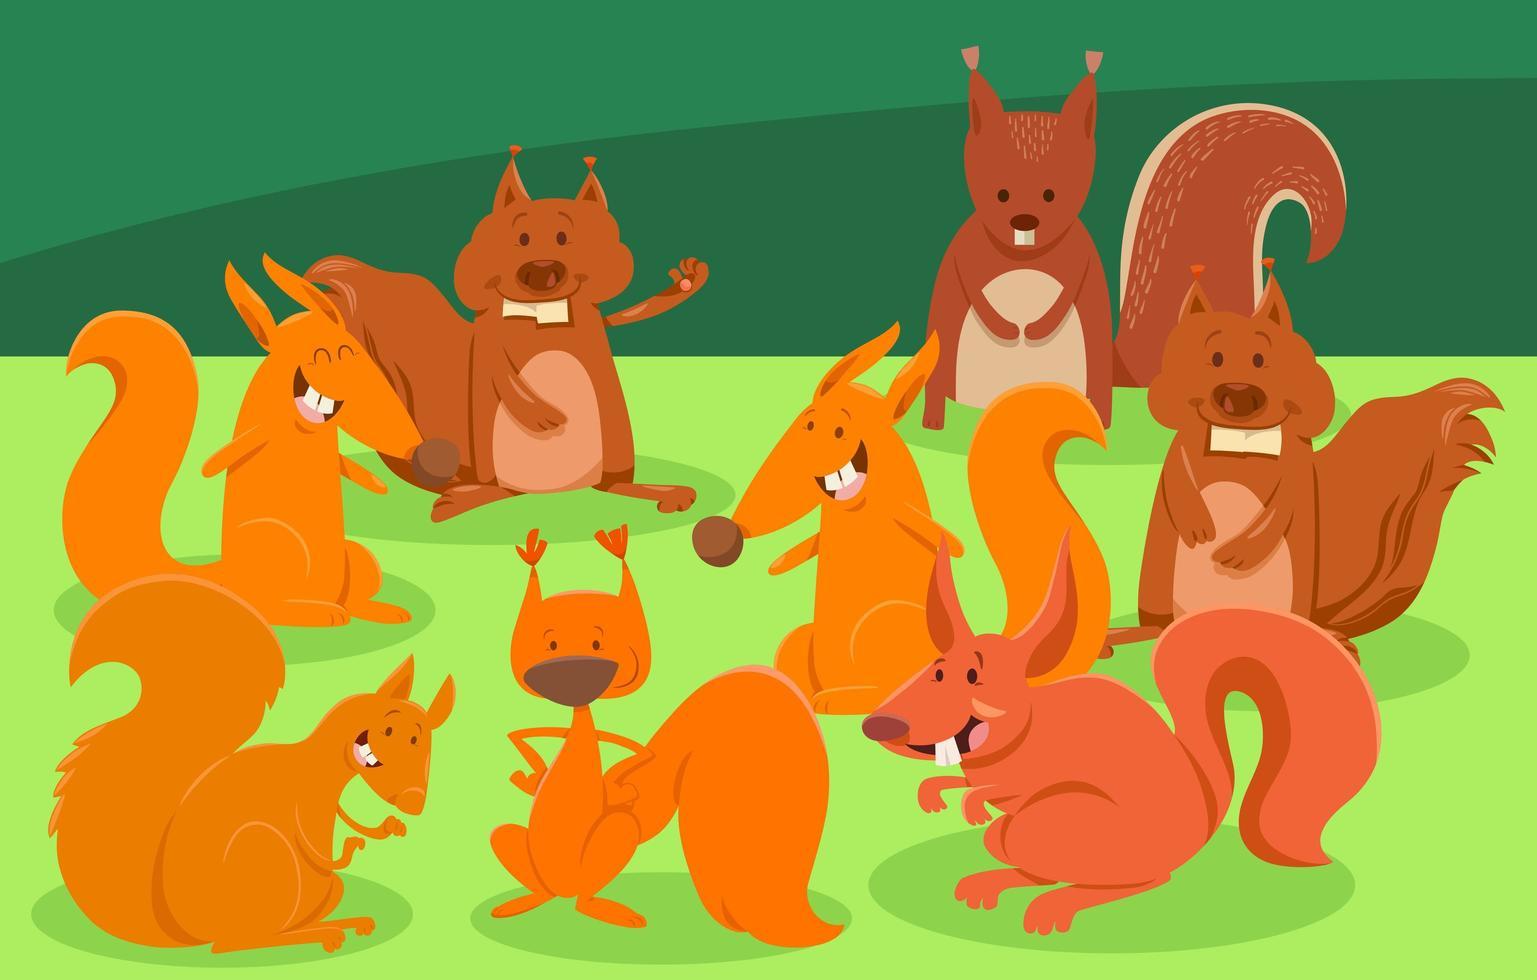 Cartoon Eichhörnchen Tier Charaktere Gruppe vektor